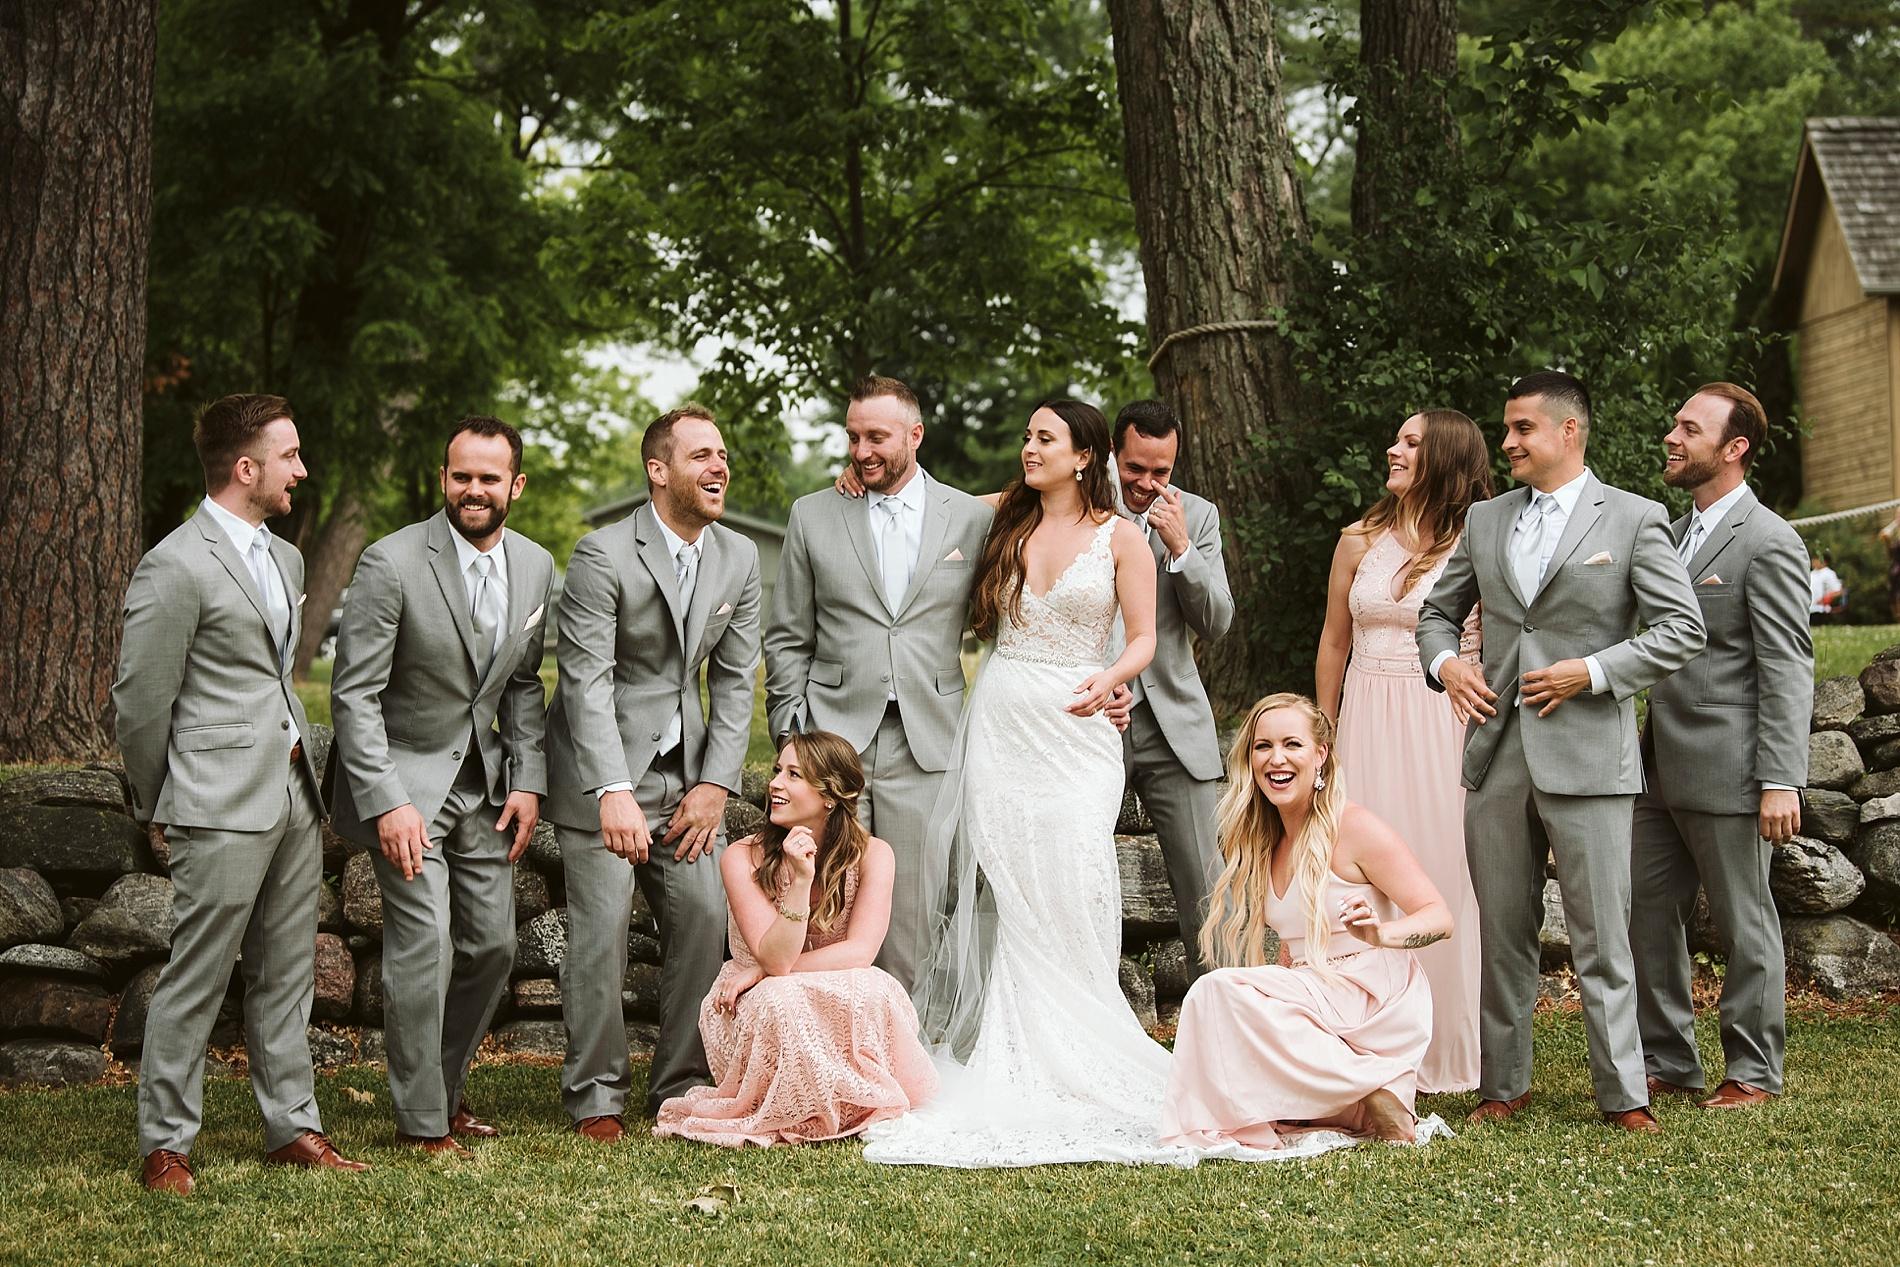 Kawartha_Lakes_Wedding_Bobcageon_Eganridge_Resort_Toronto_Photographer_0045.jpg